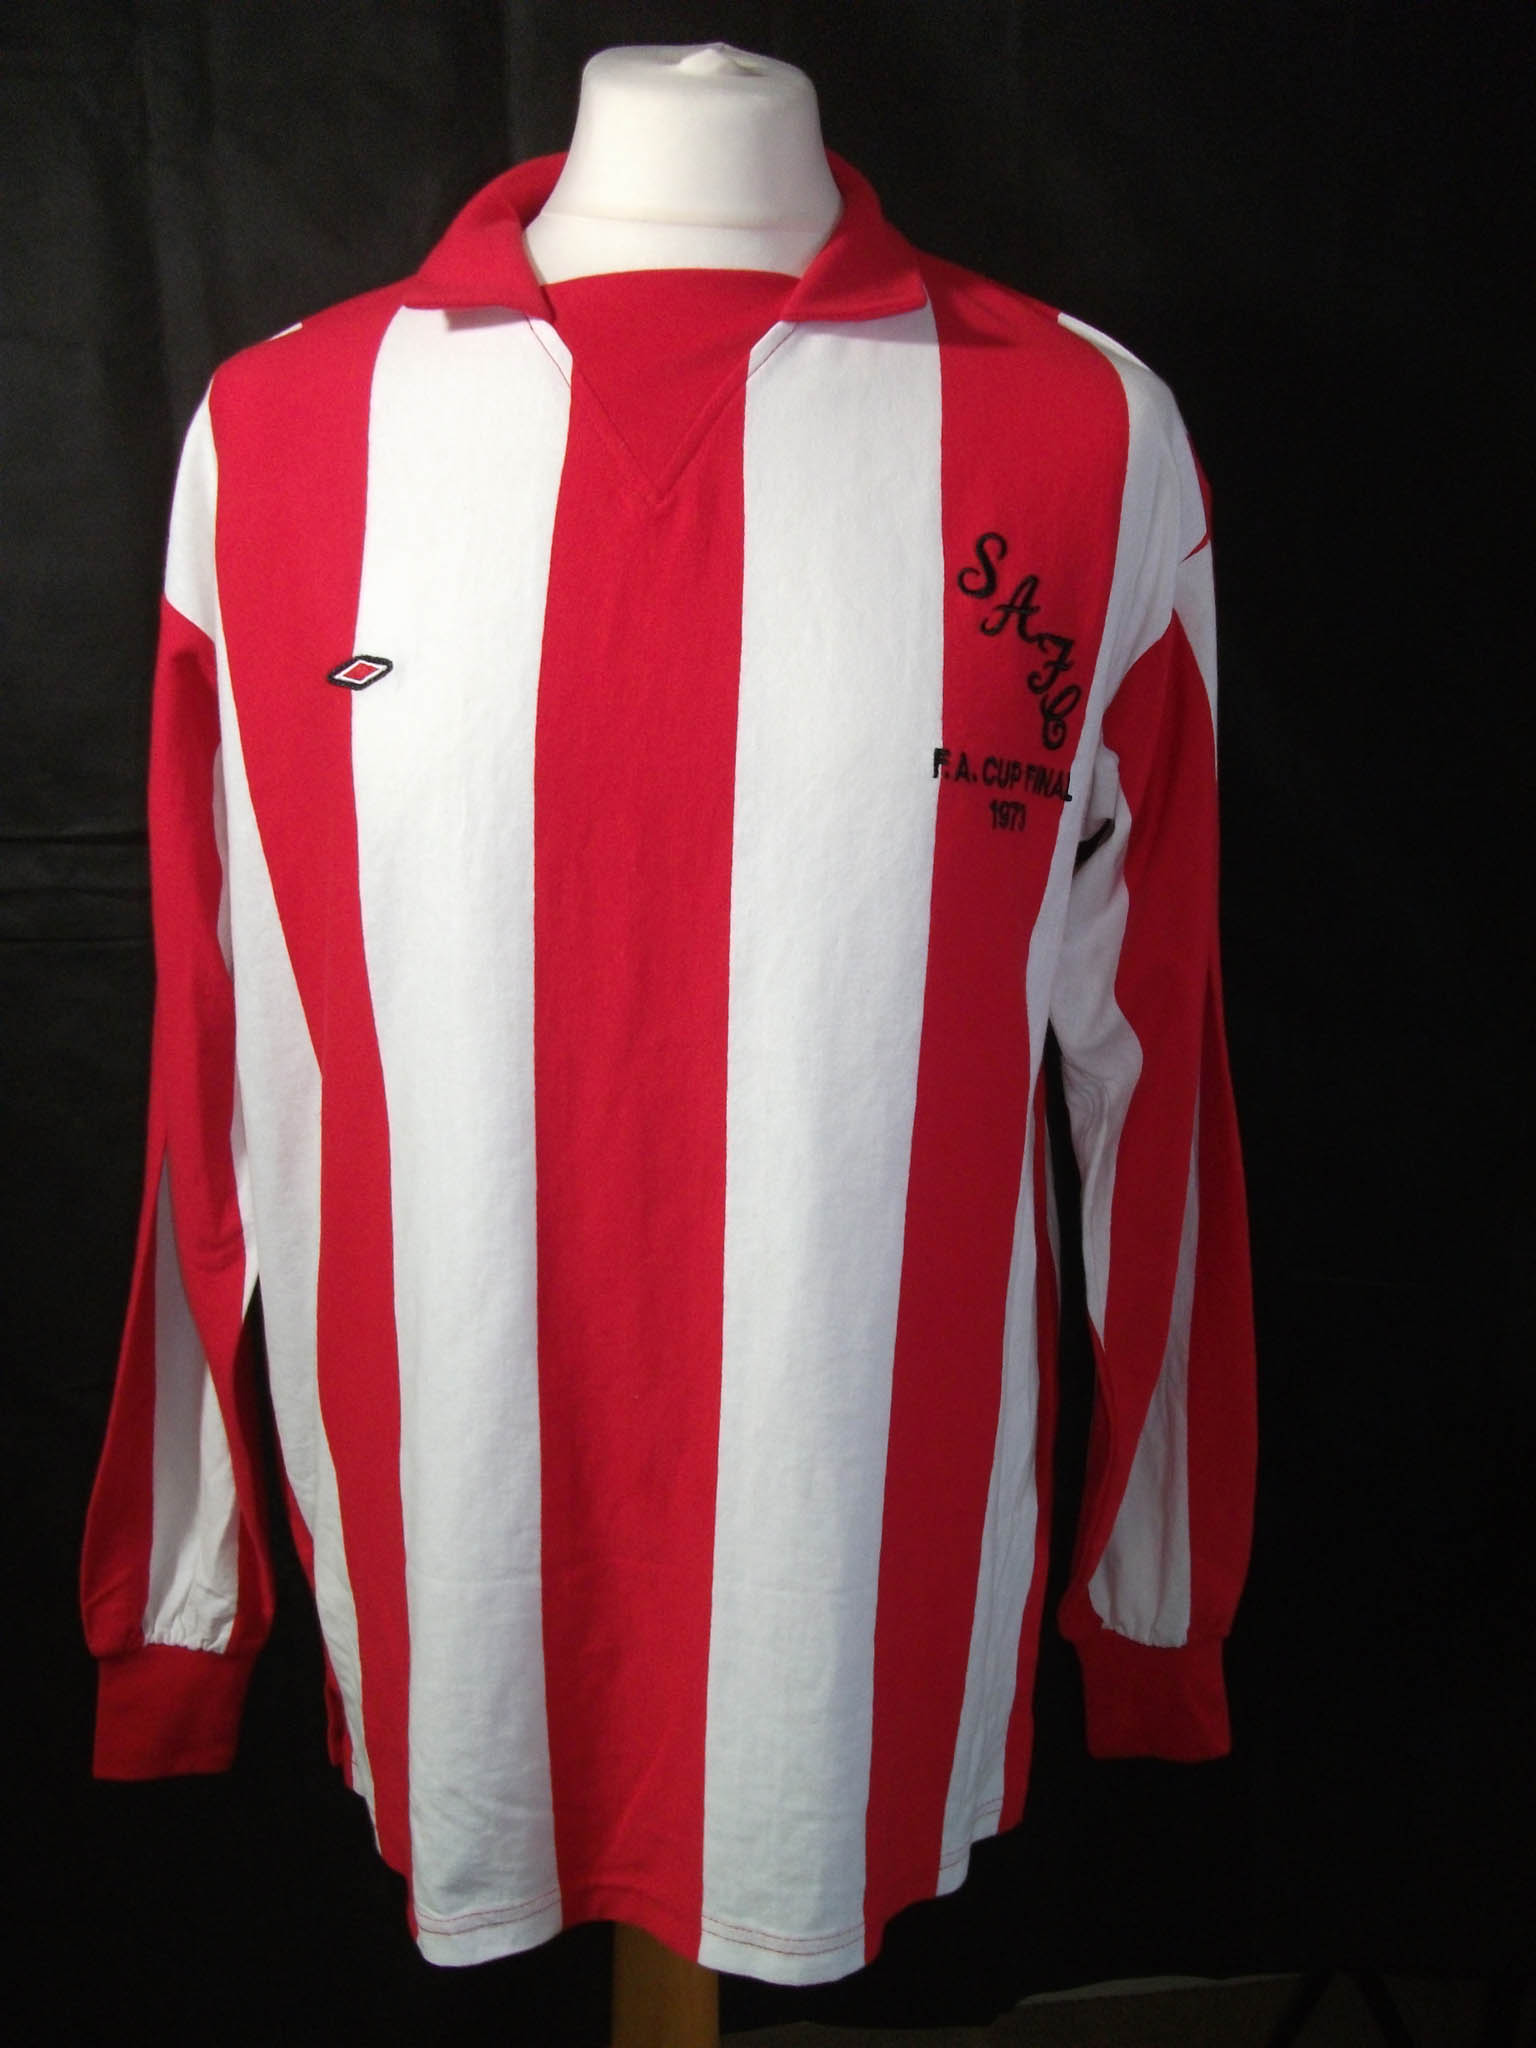 Replica Umbro 1973 Sunderland FA CUP Final football shirt.1